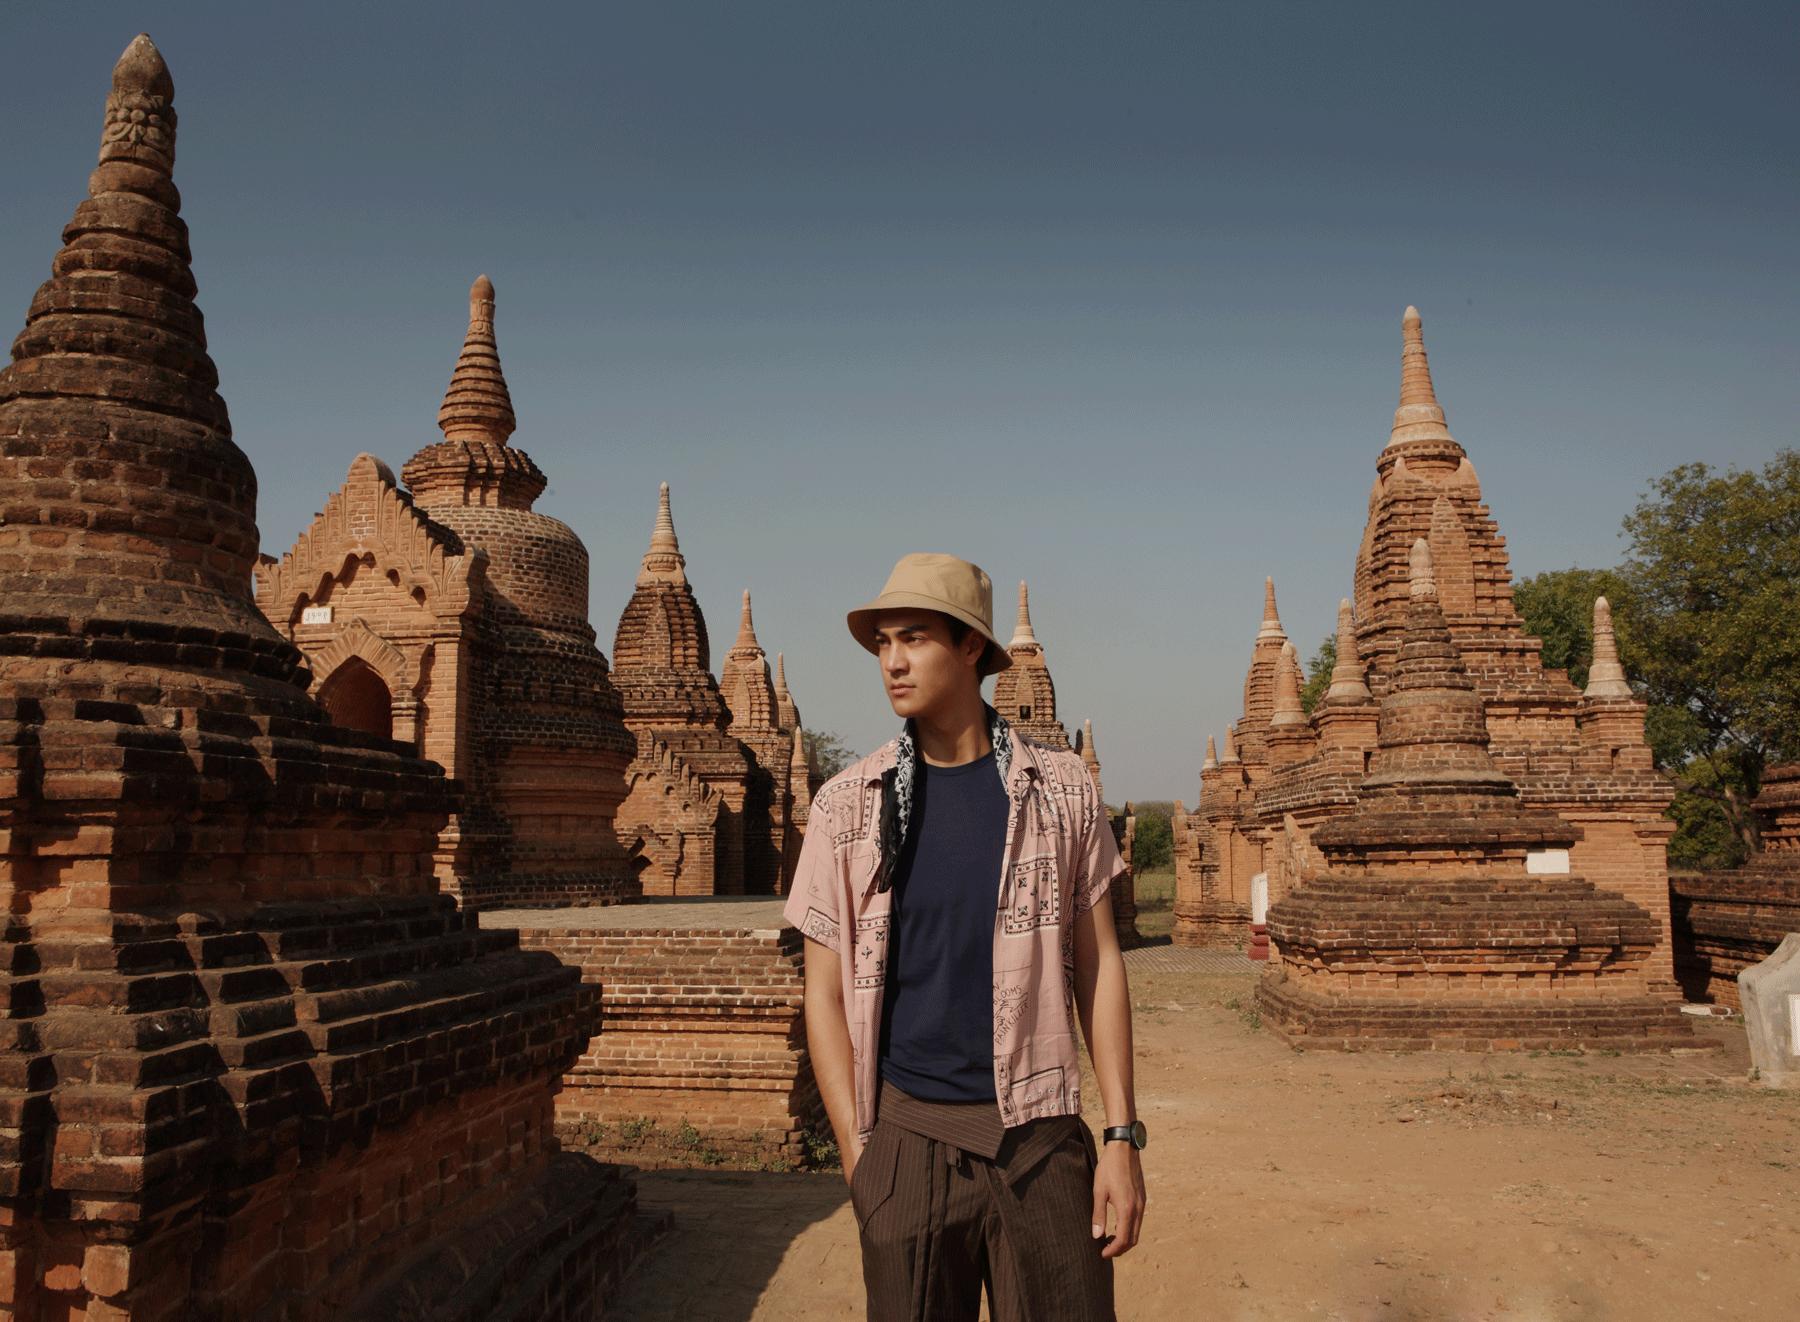 Khaymingha Temple  Tshirt : JOCKEY / shirt : PAINKILLER / pants : SARIT / watch : FORREST